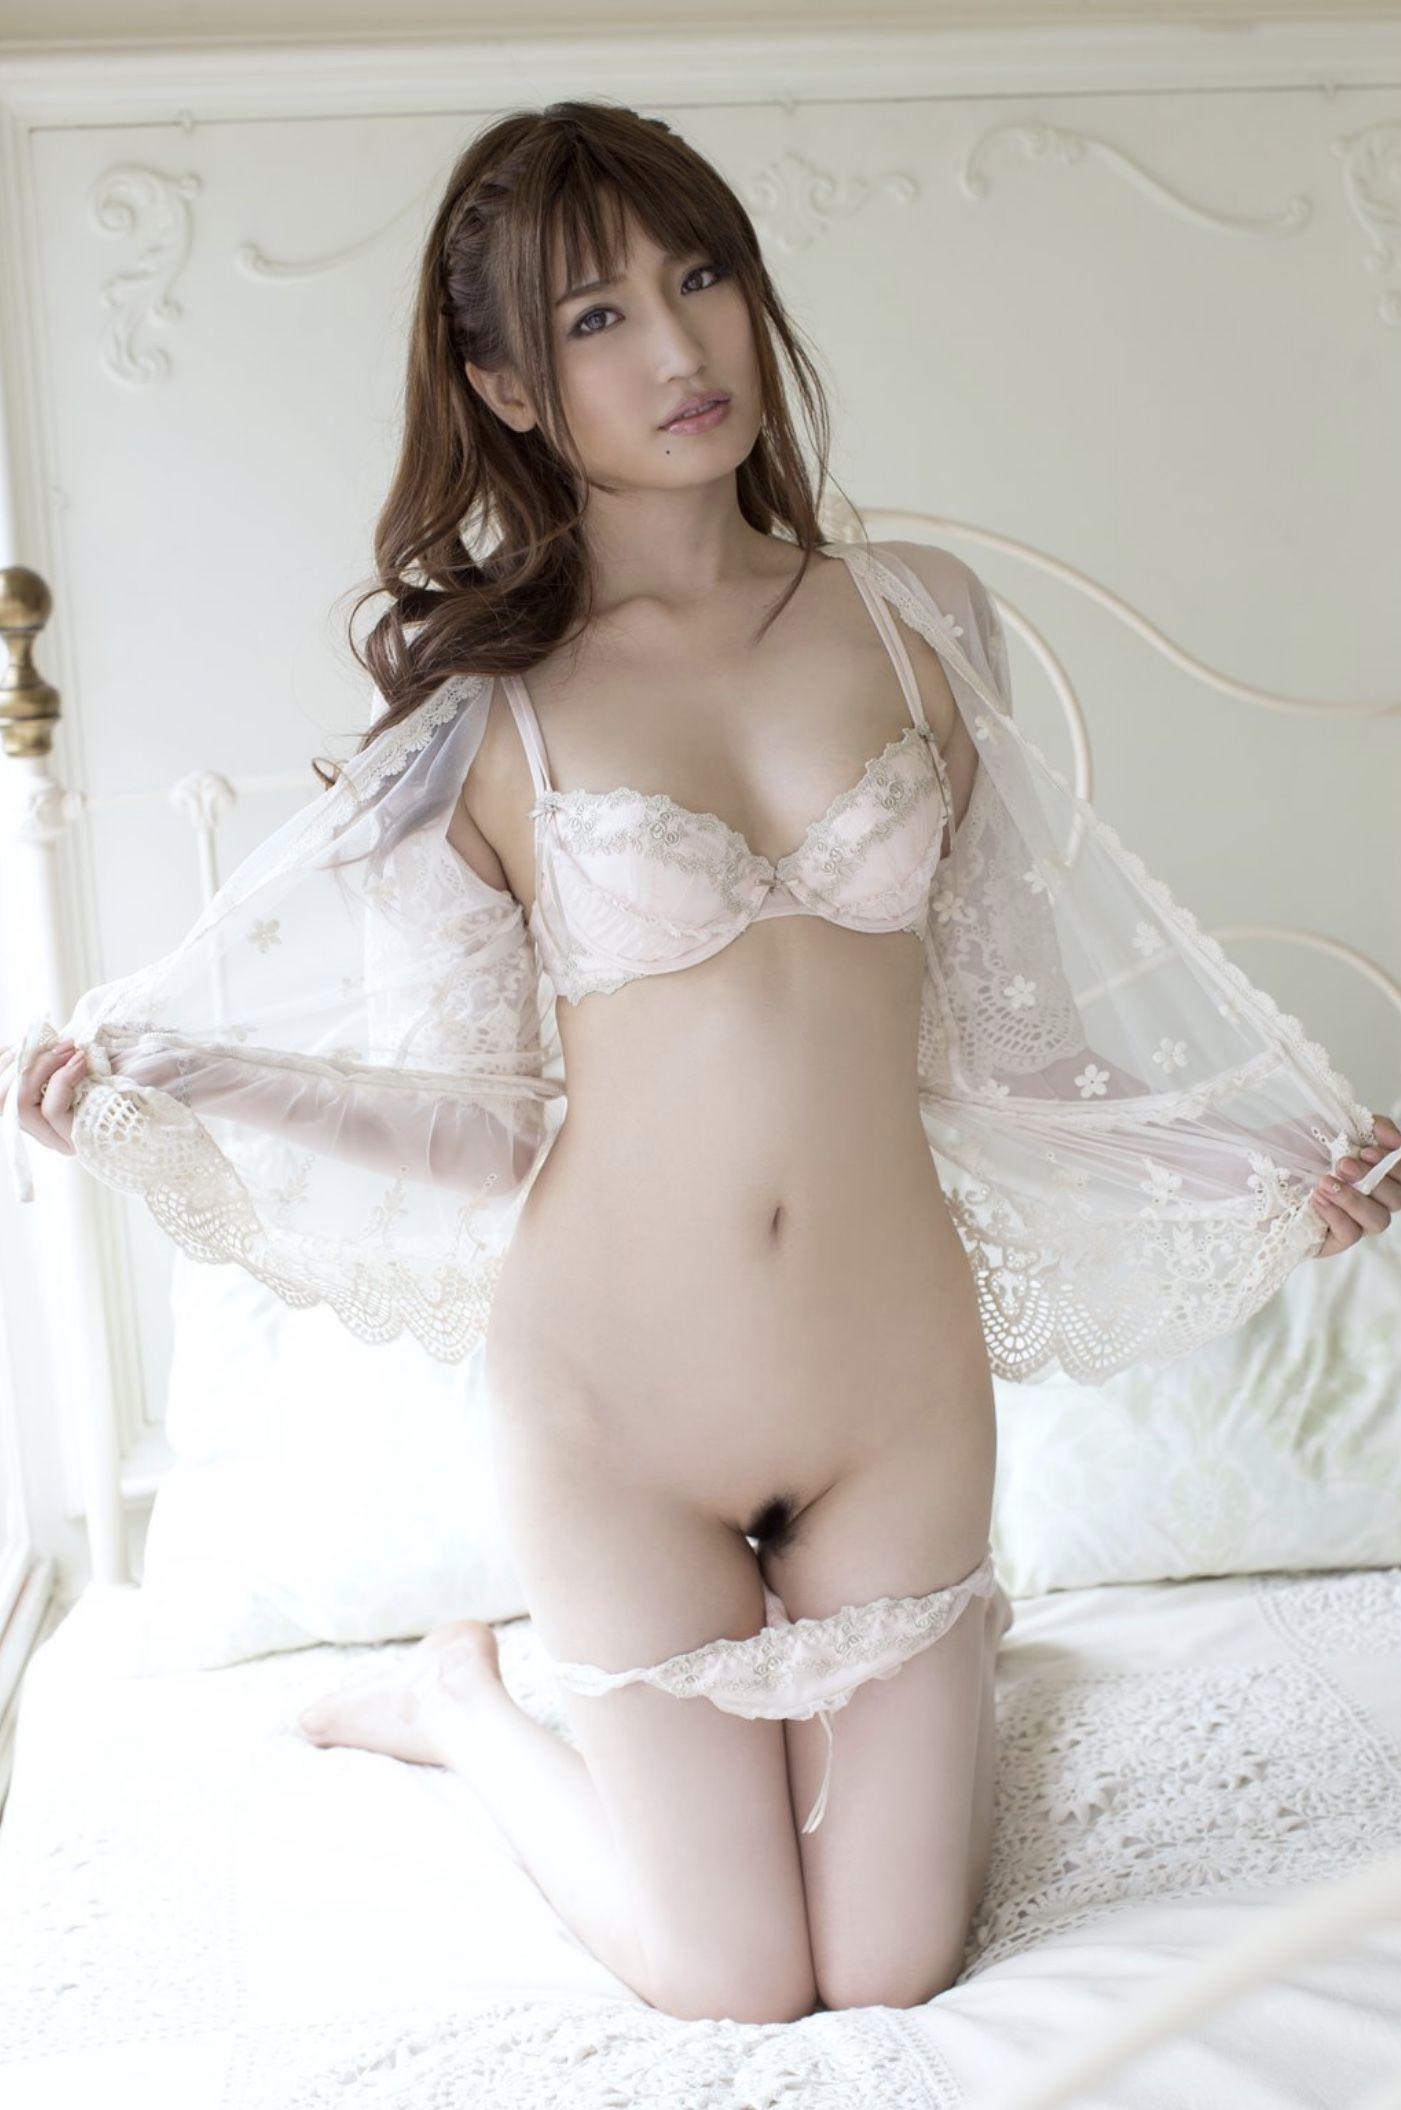 AVデビュー直前ヌード 愛沢かりん photo 019